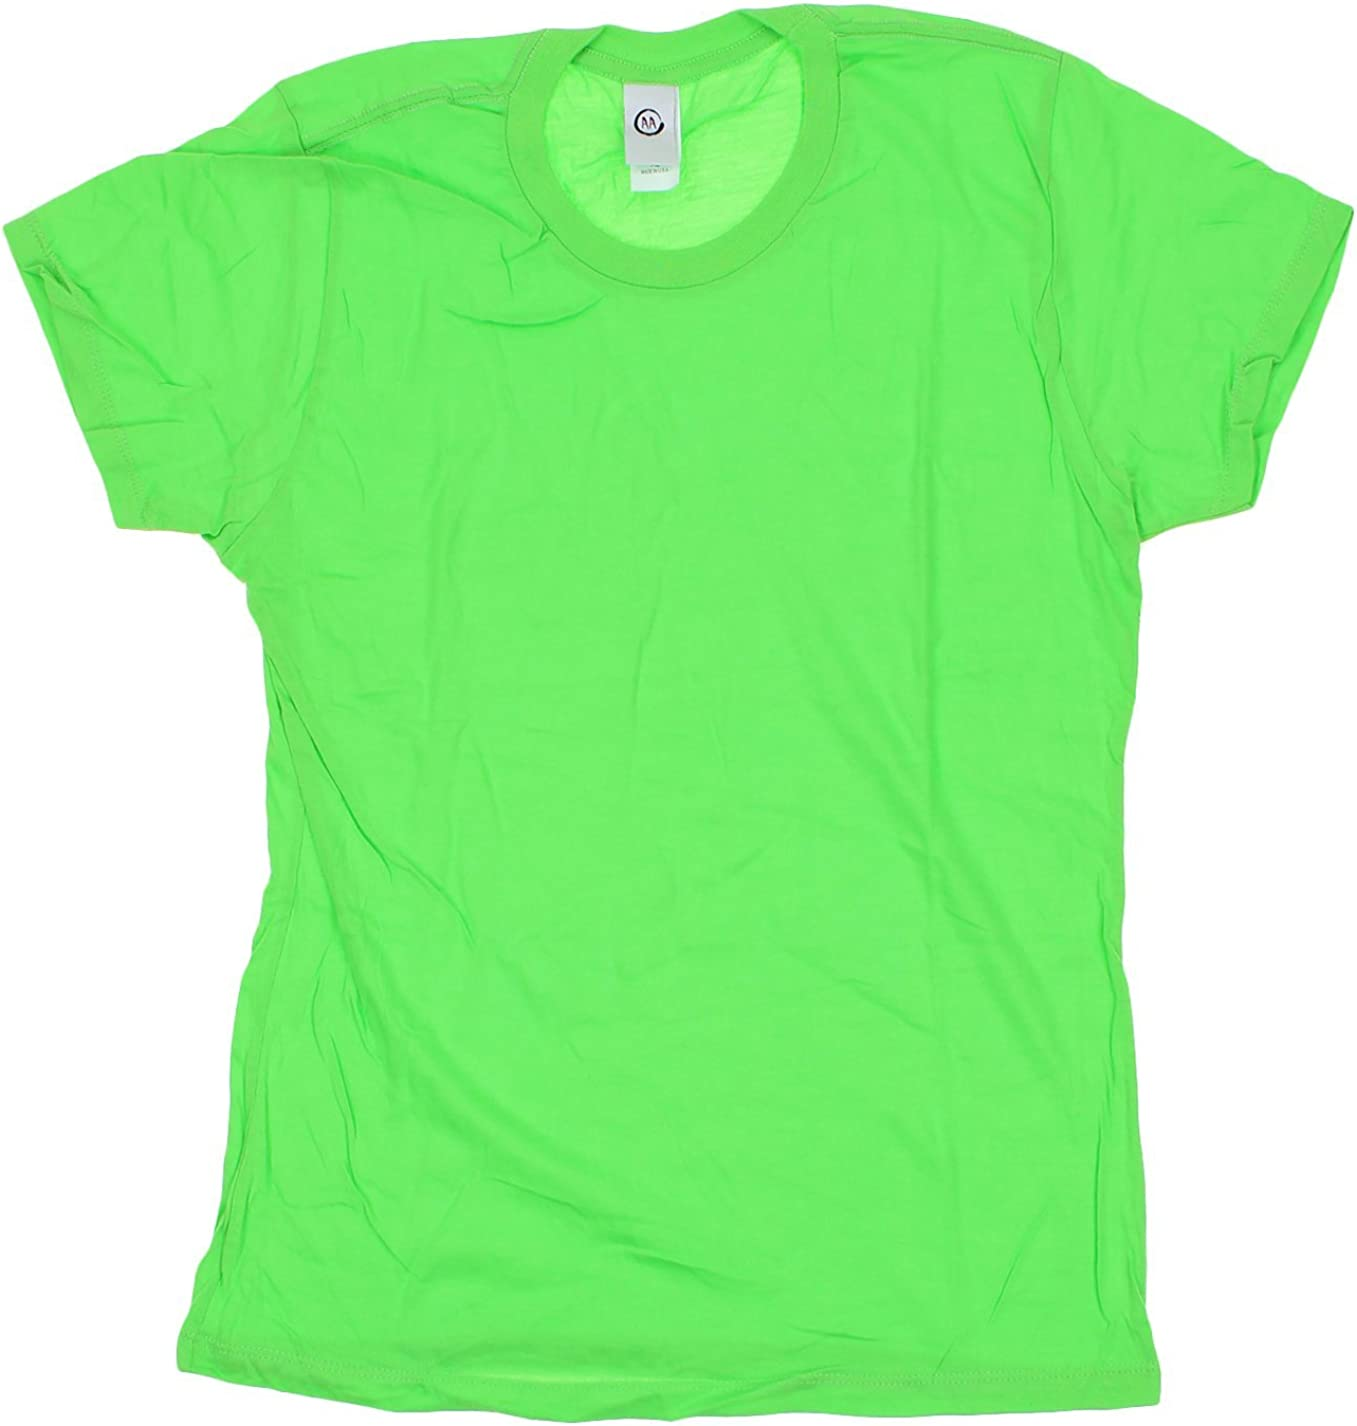 Active Apparel Inc Womens Basic Short Sleeve Tee (XL), Bright Green